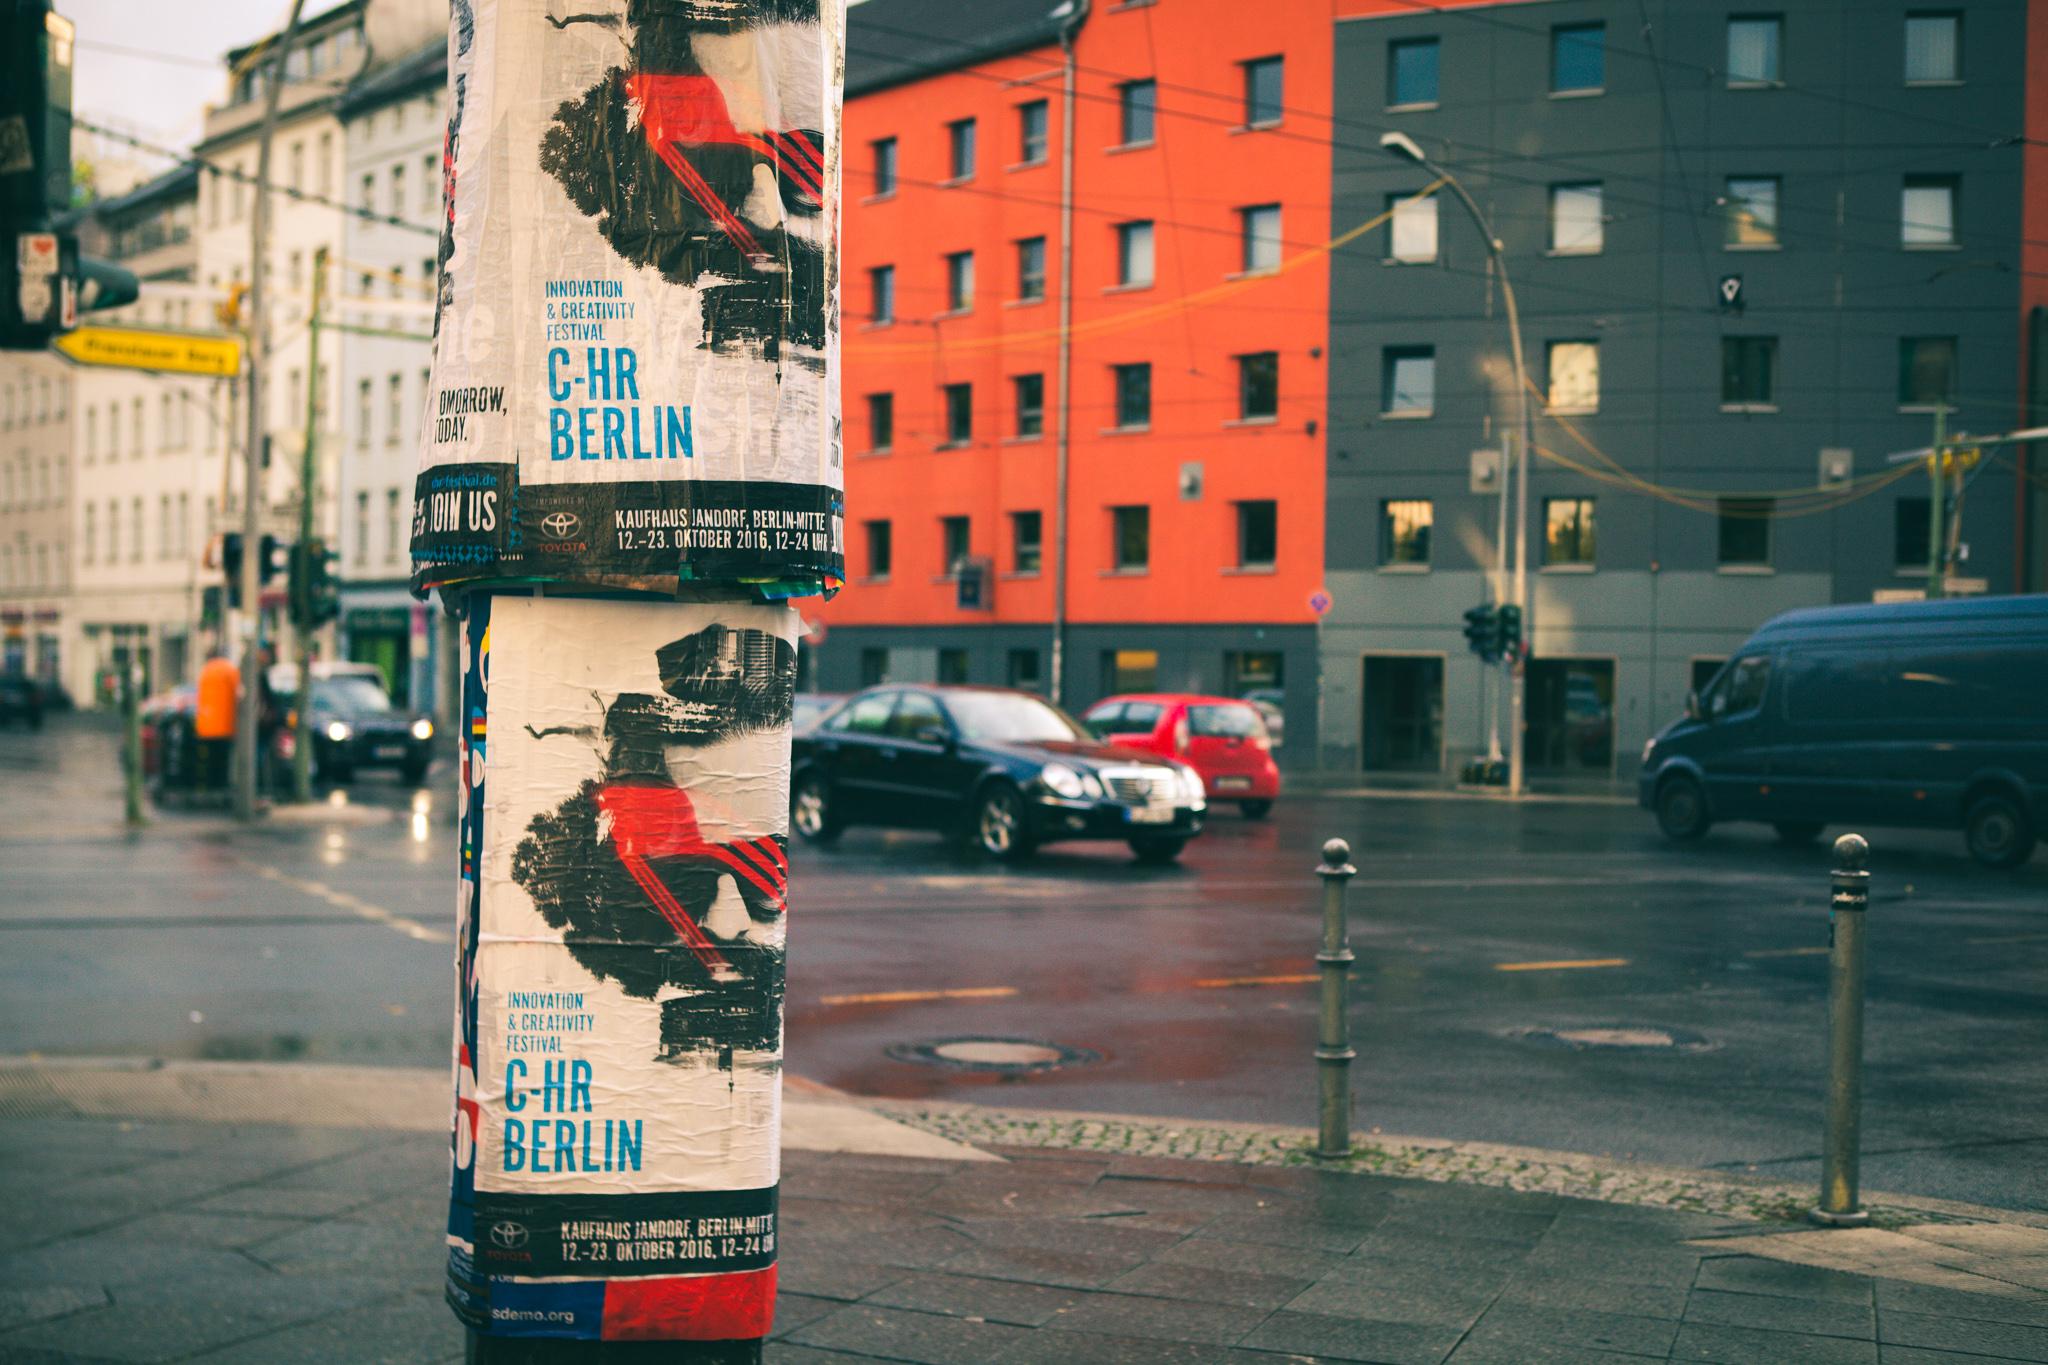 C-HR_BERLIN_Festival-0001.jpg